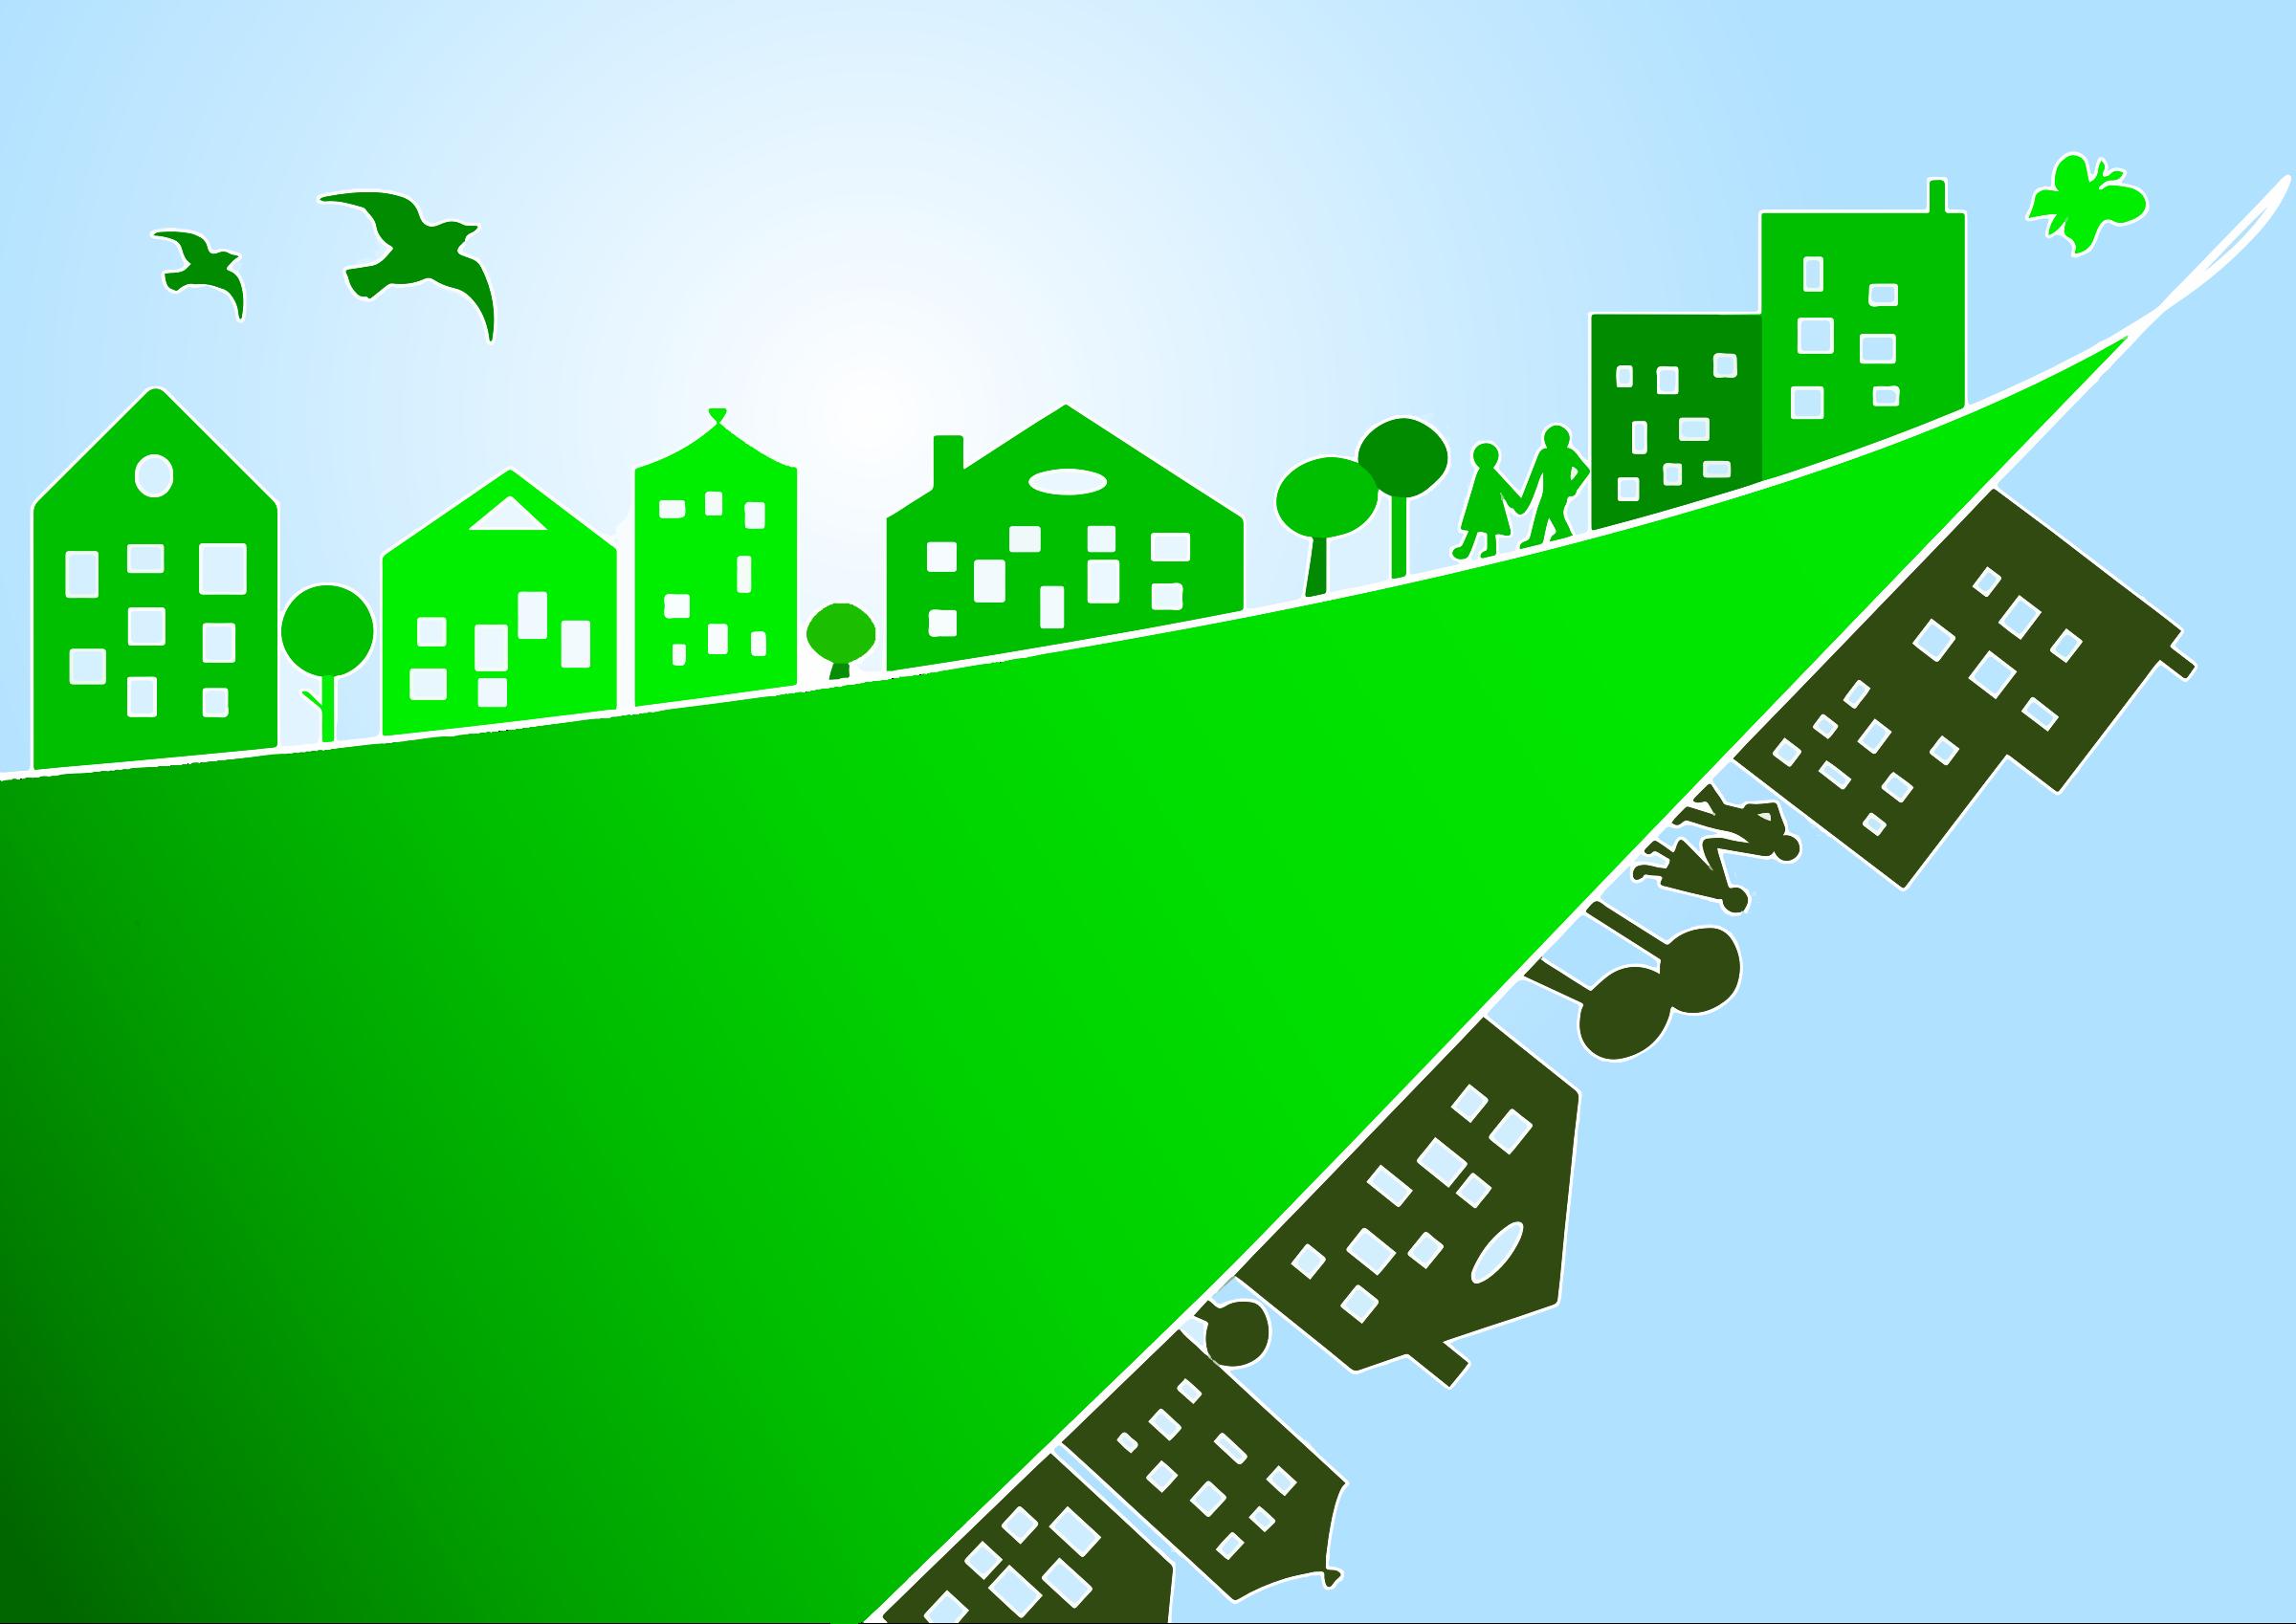 Clipart - Environmental Awareness